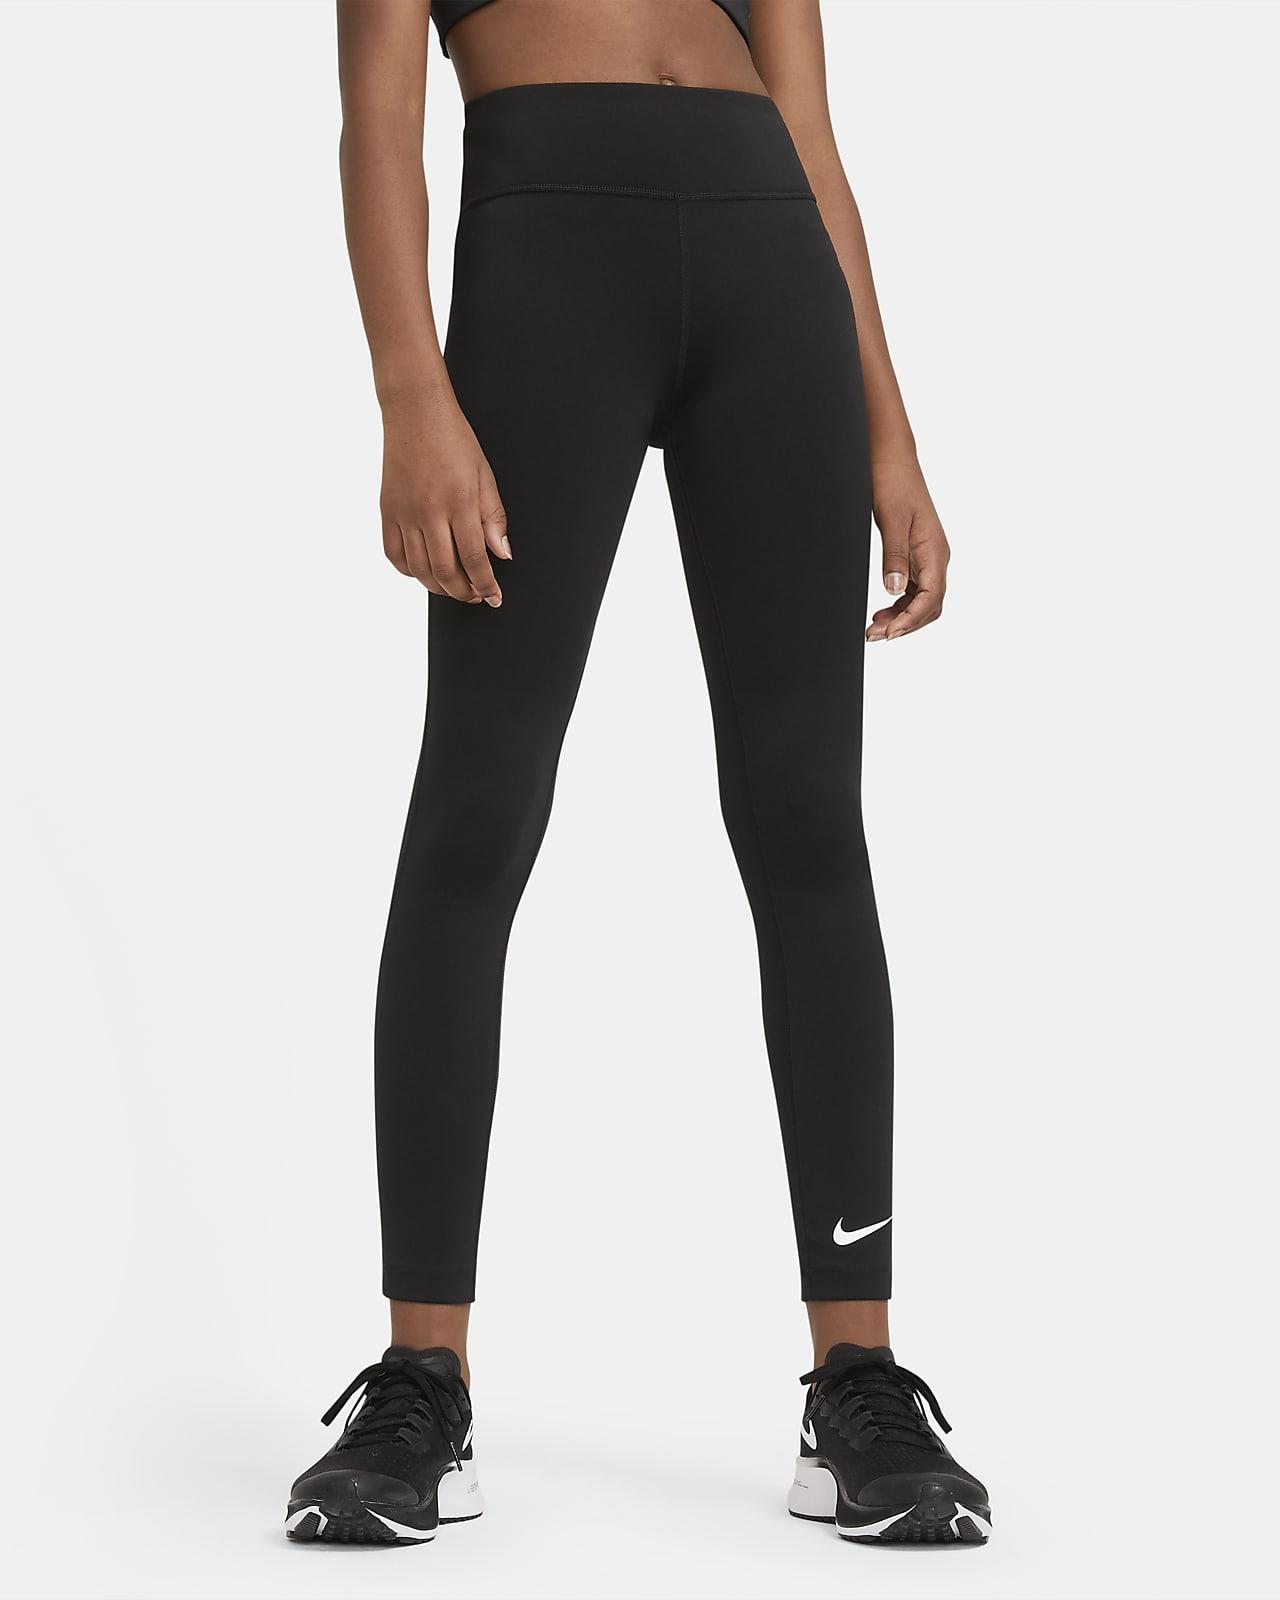 Leggings de entrenamiento de cintura alta para niñas talla grande Nike One